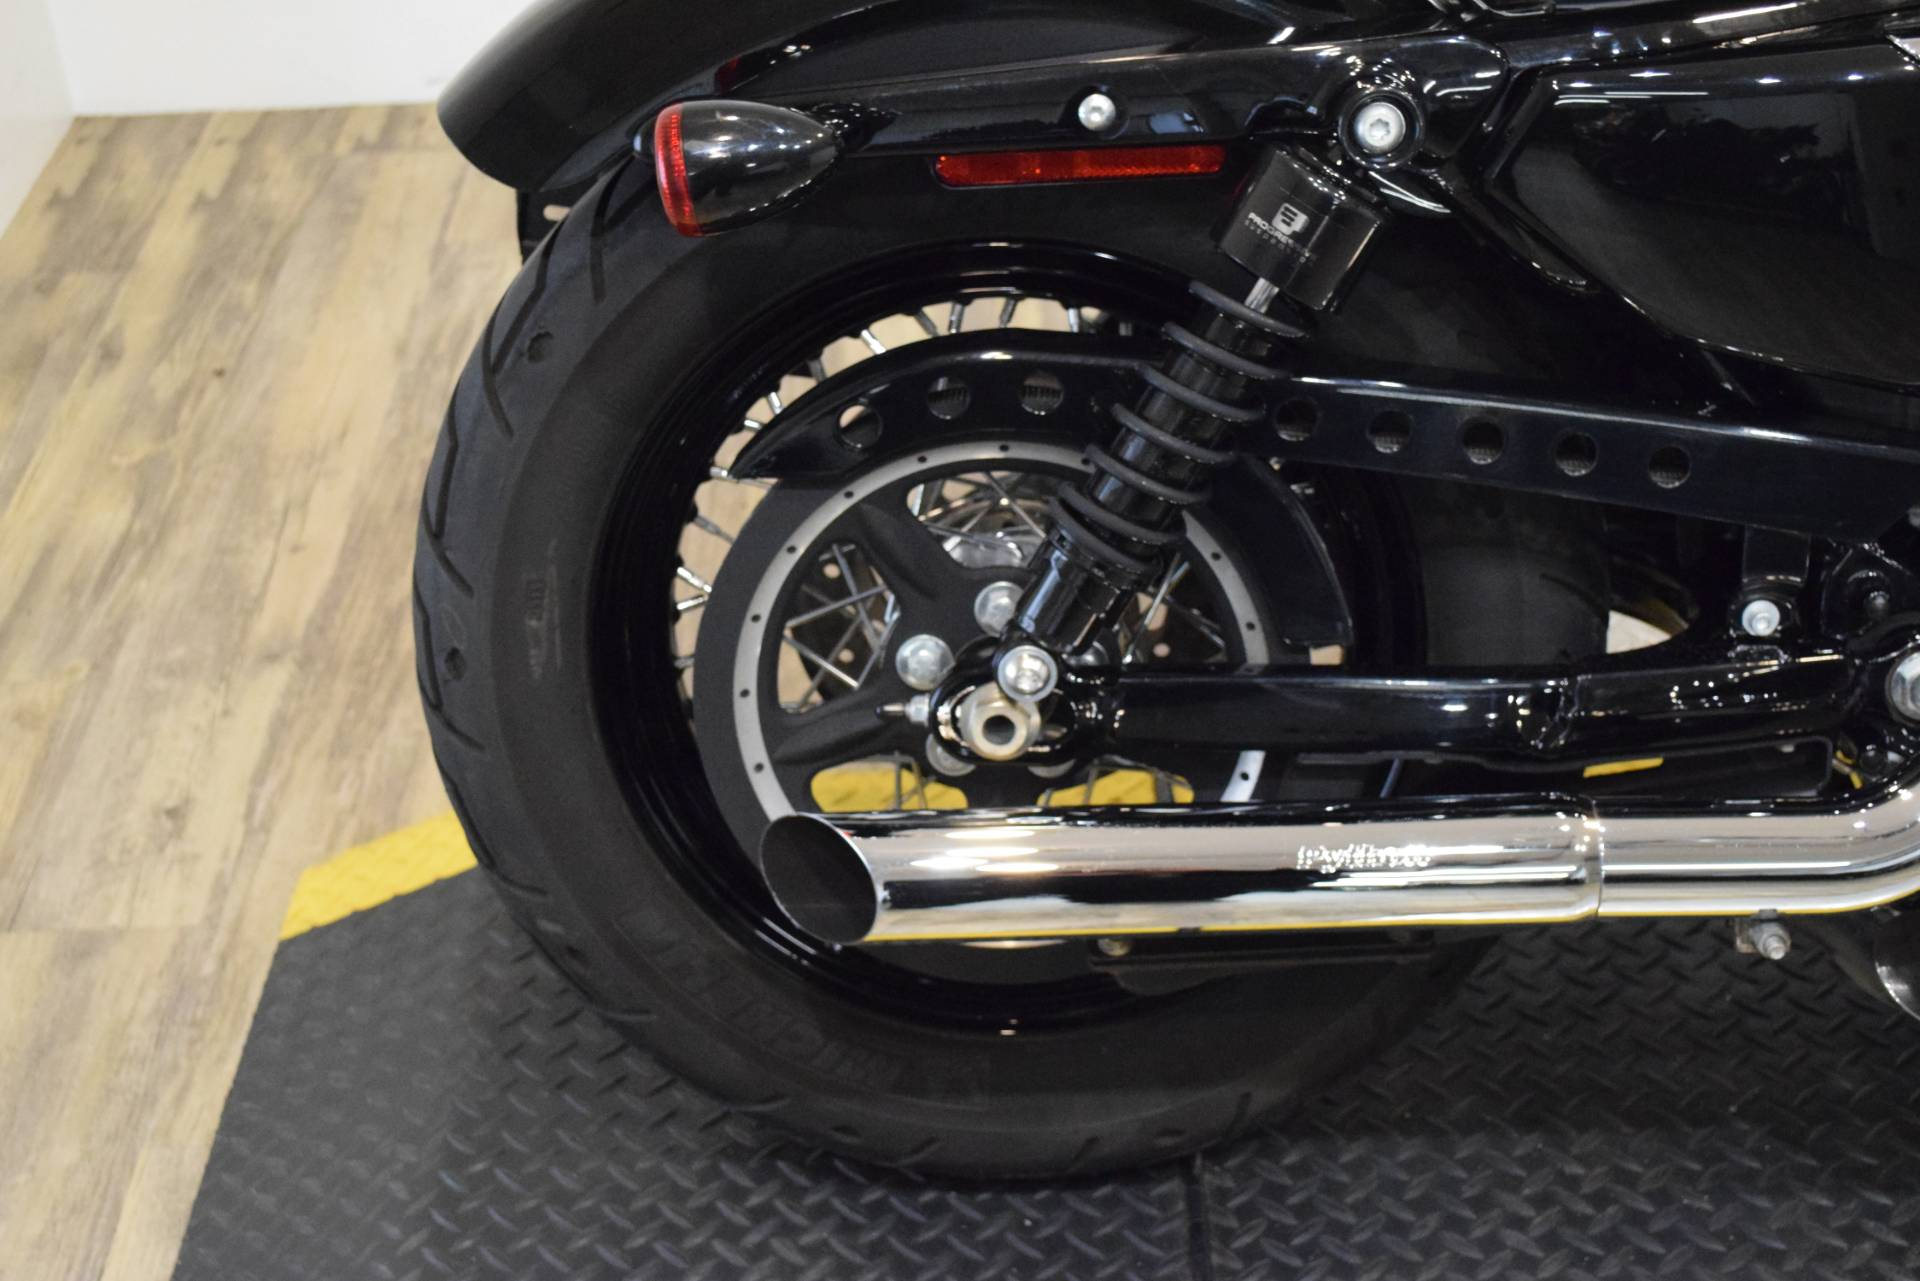 2013 Harley-Davidson Sportster Forty-Eight 9